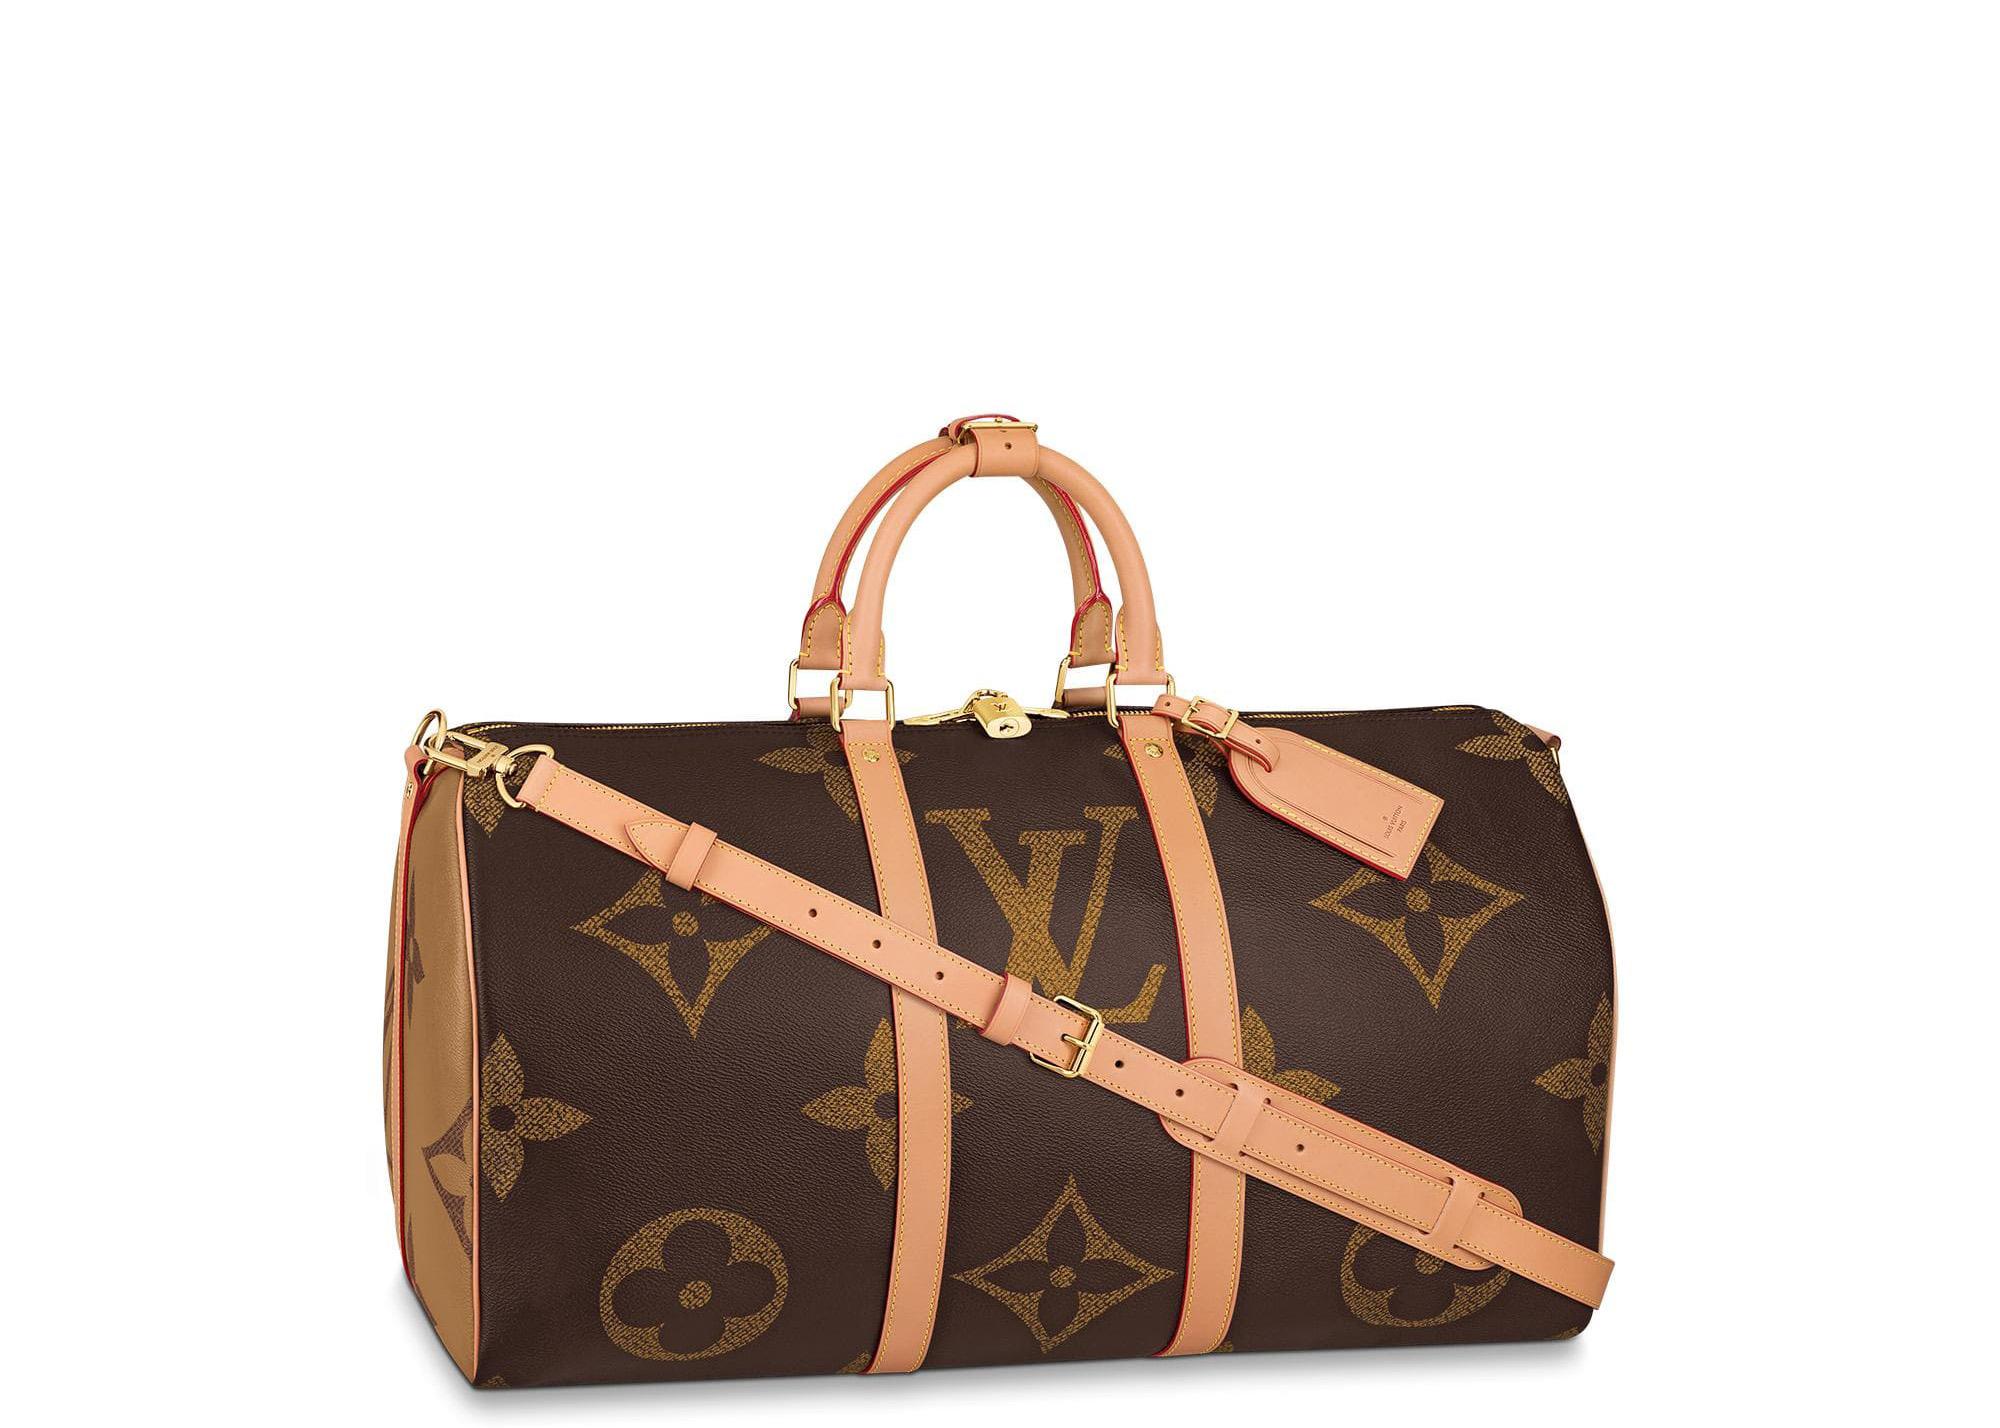 Louis Vuitton Keepall Bandouliere Monogram Giant Reverse 50 Brown